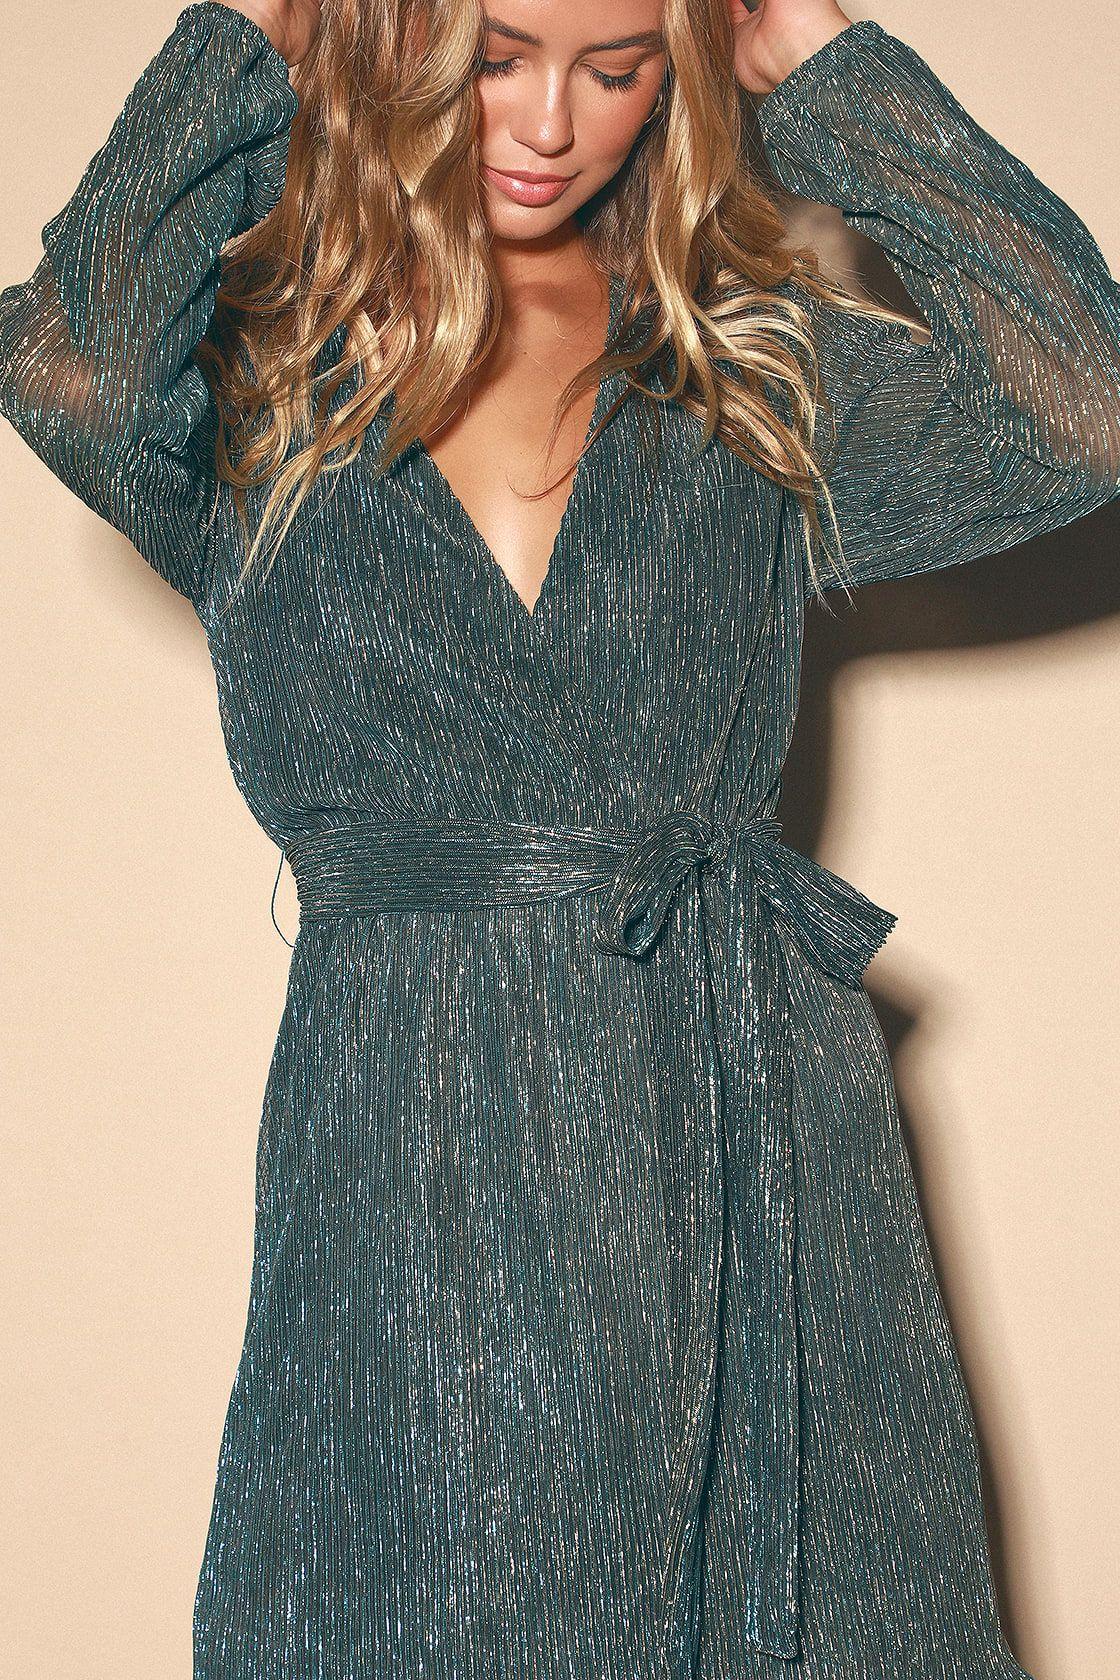 Flirt about it gold and teal blue metallic mini dress